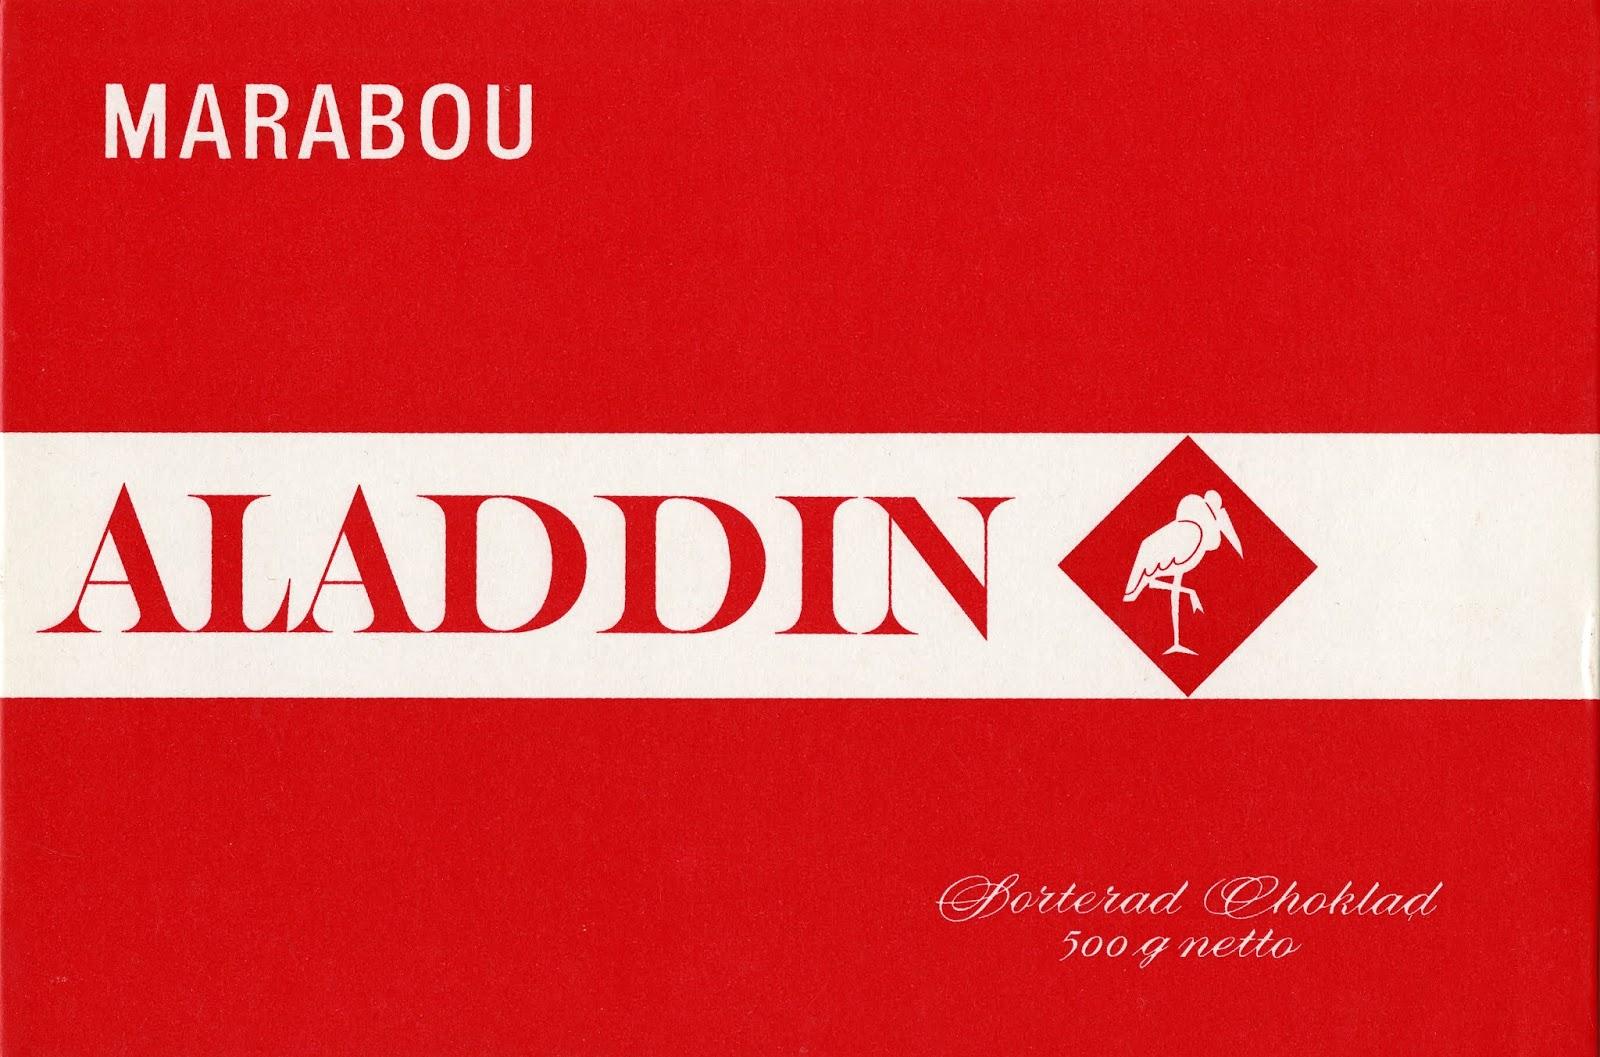 aladdin choklad 2016